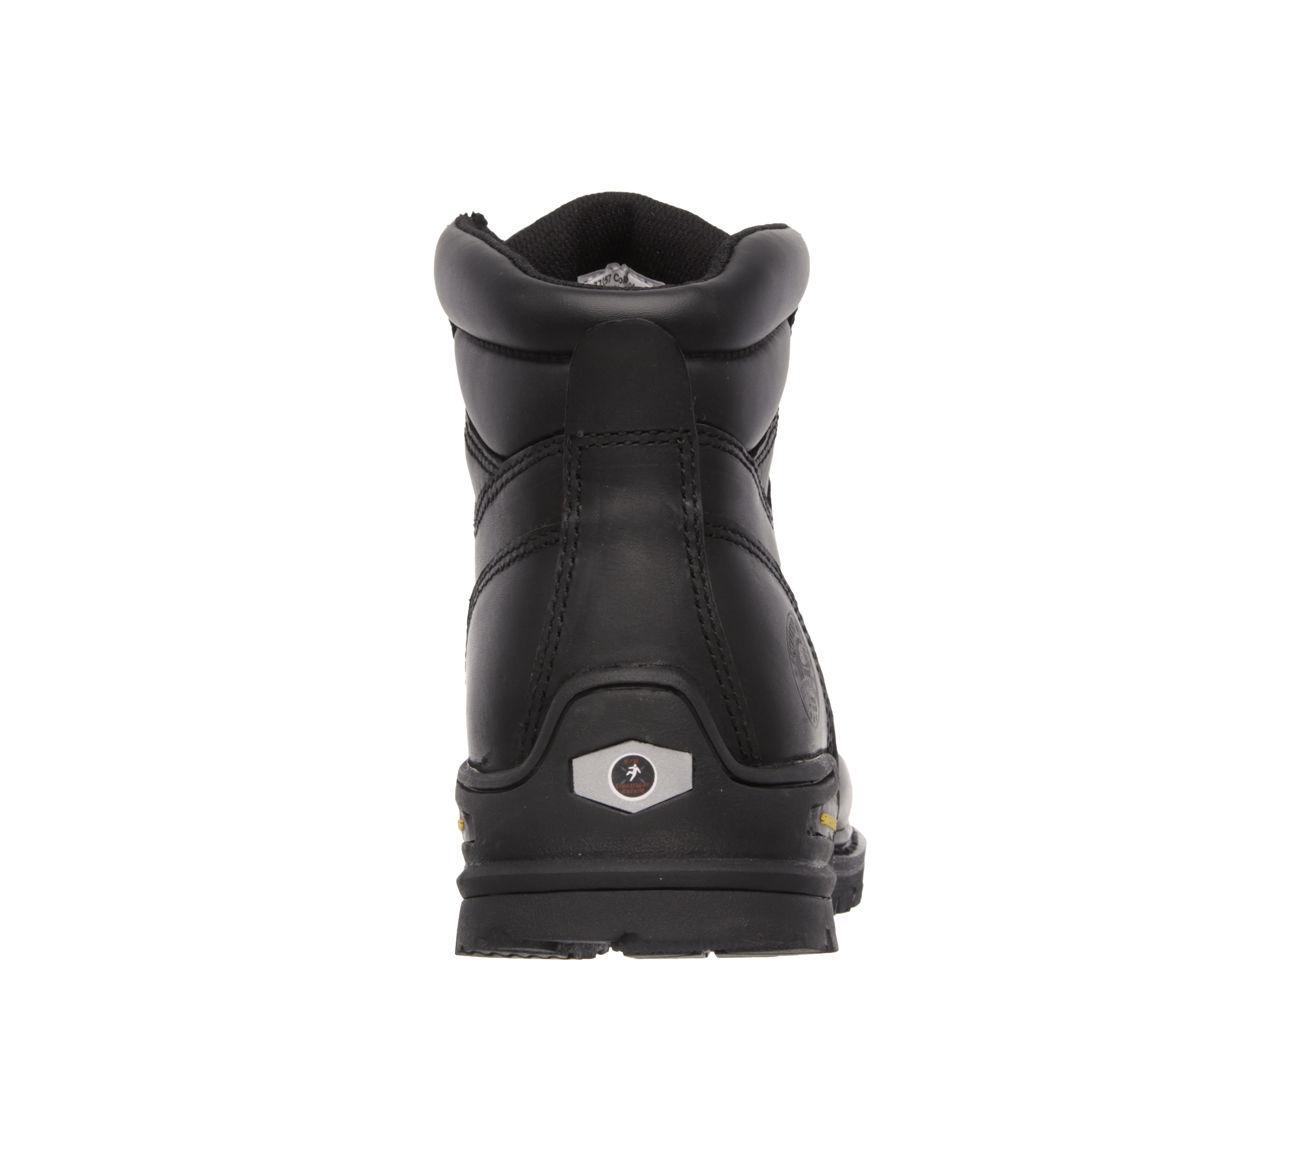 8ab354f2299b3 Men's SKECHERS WORK: RELAXED FIT -Kener STEEL TOE Boot, 77057 BOL Size 9